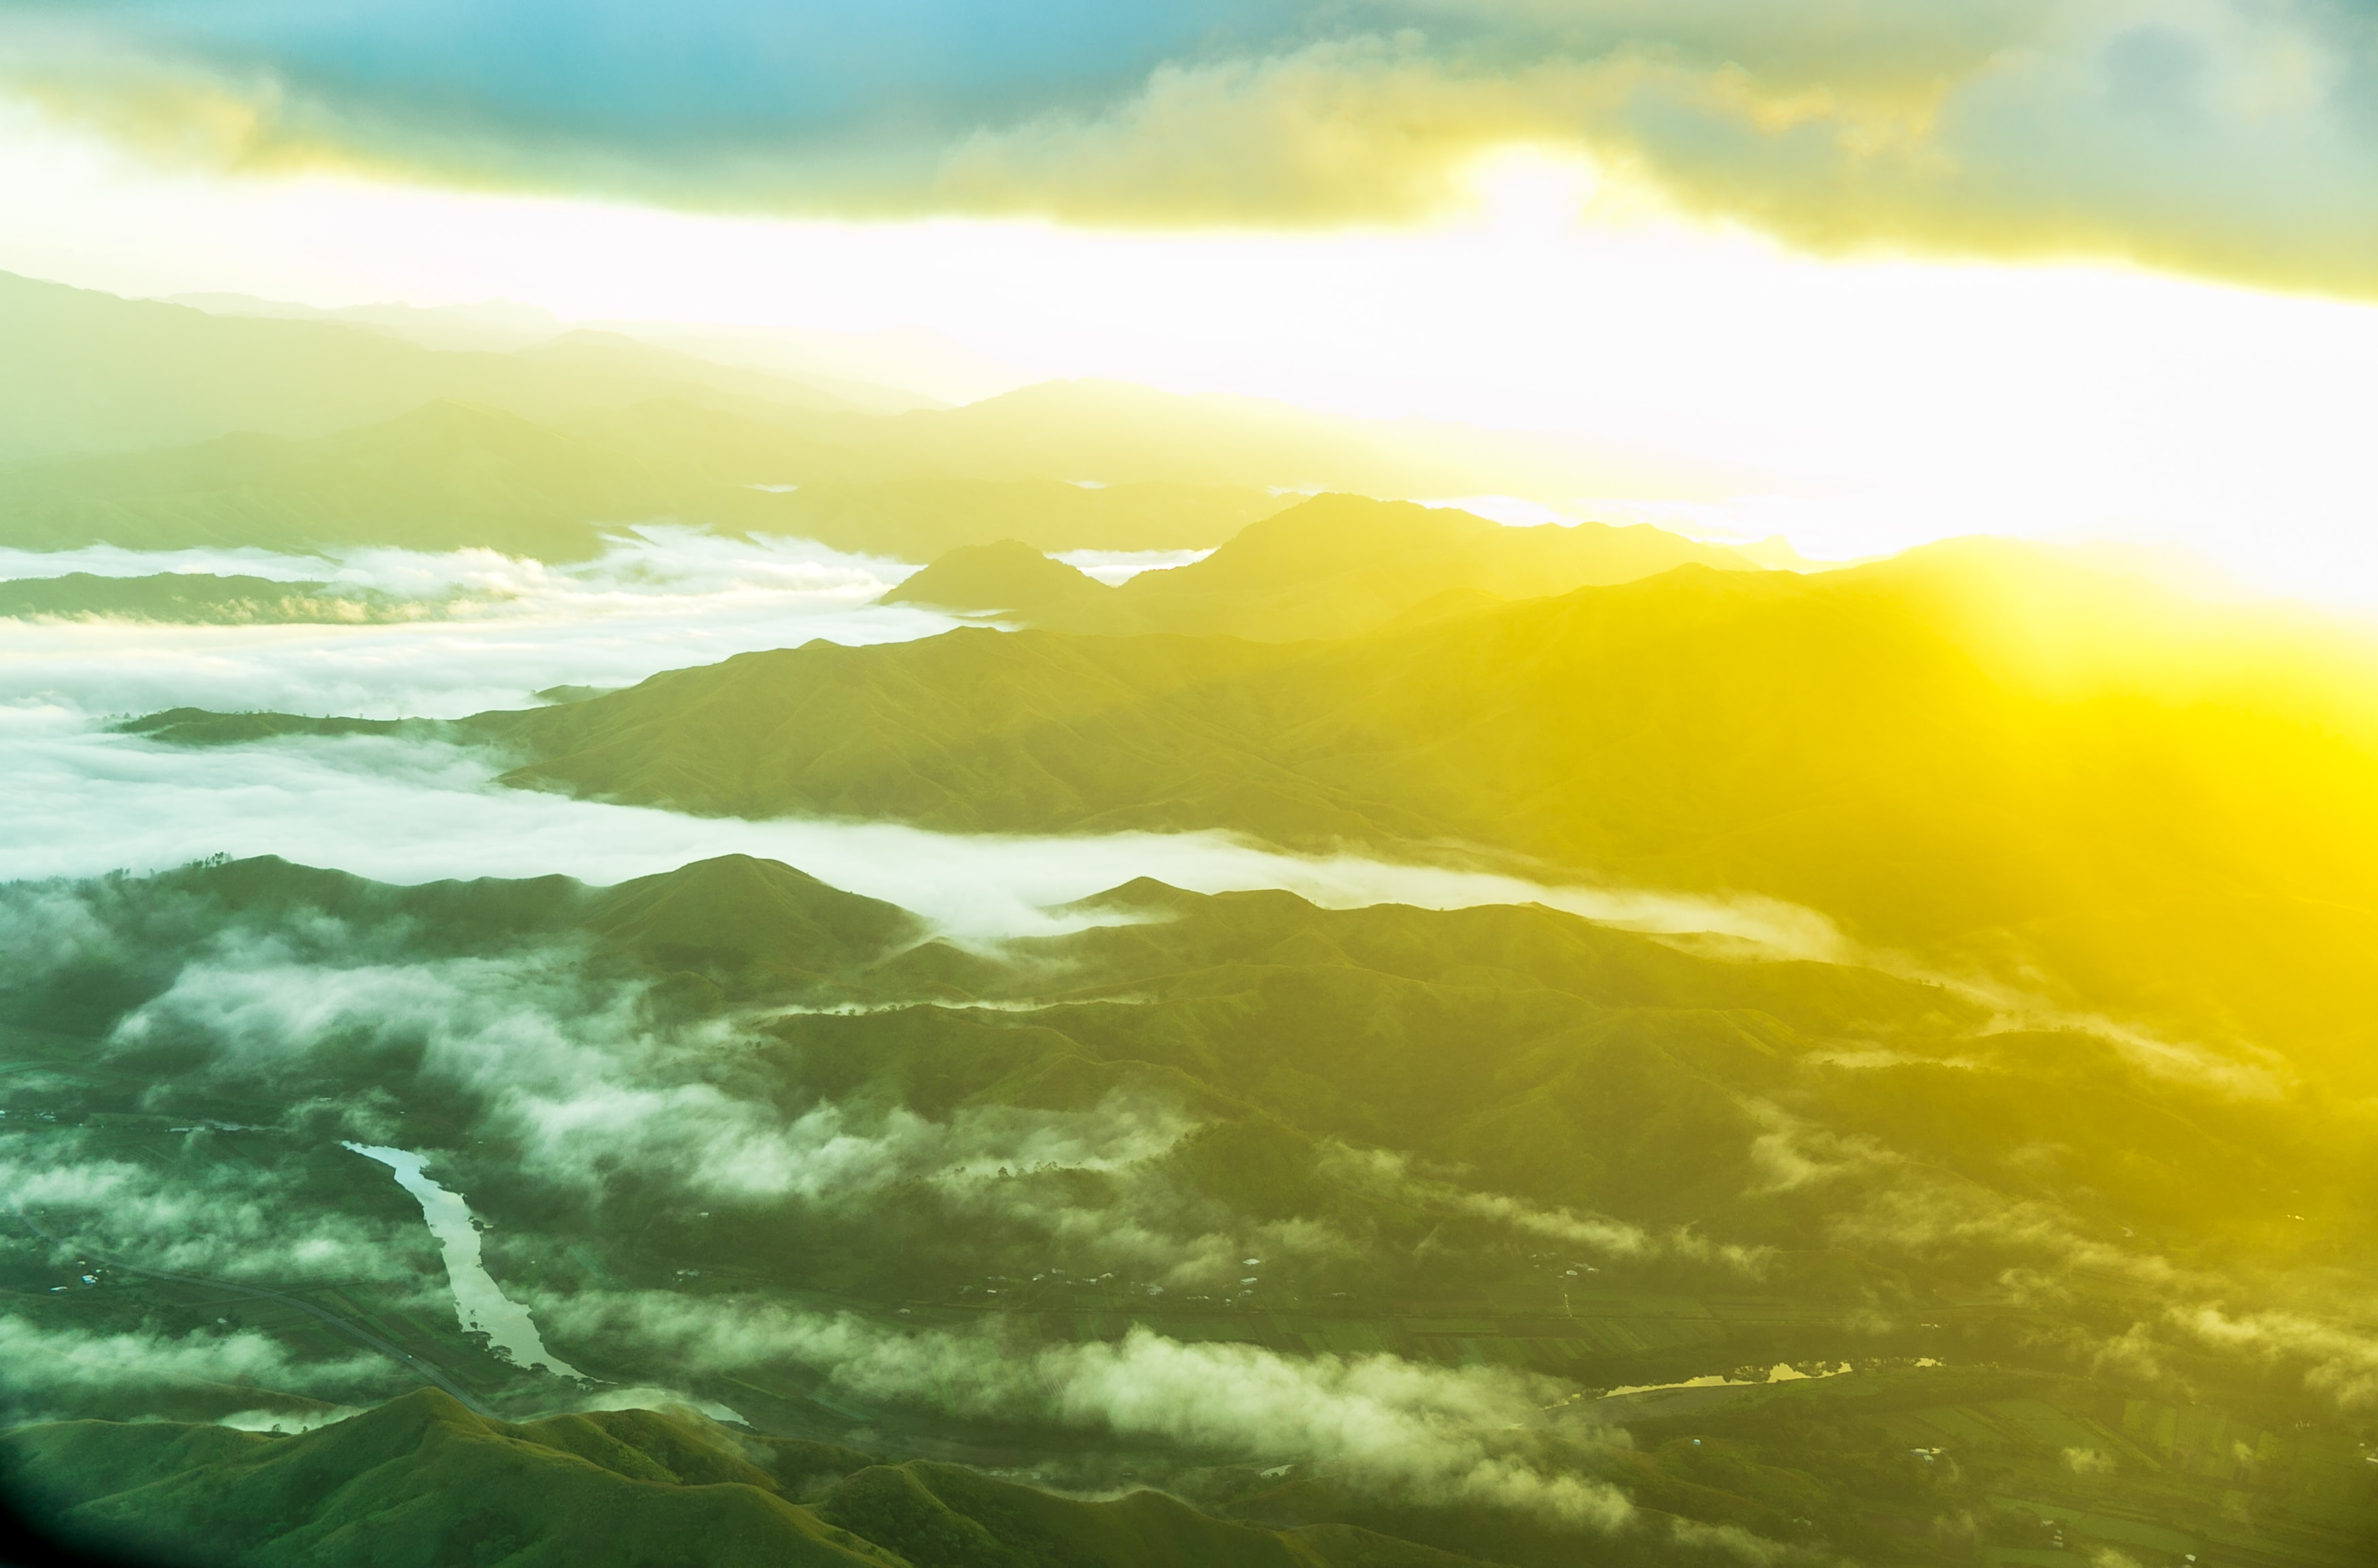 Colorful sun rises over foggy mountainscape in Suva Fiji